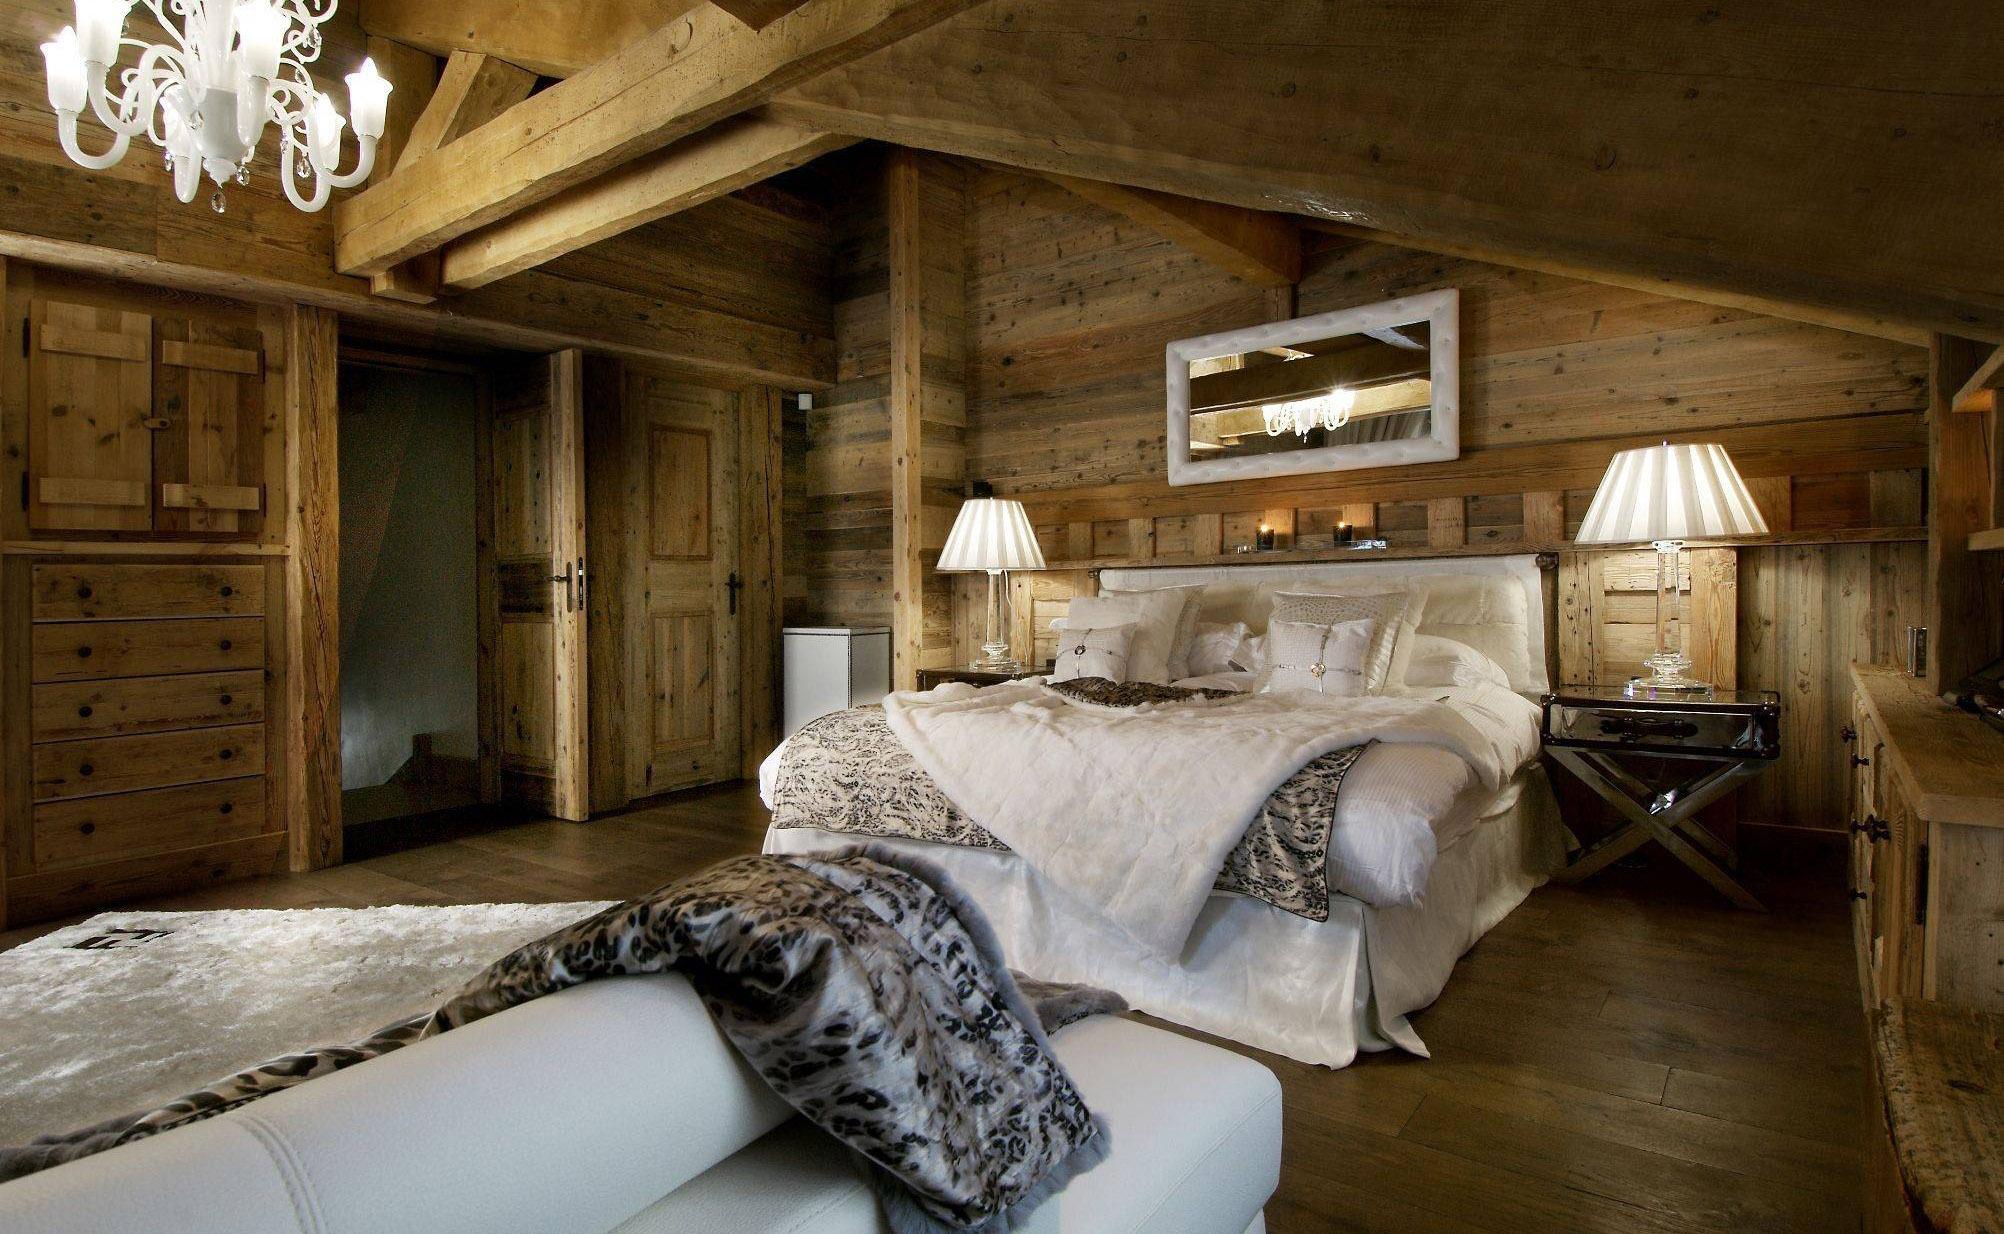 Lovelydays luxury service apartment rental - Courchevel - Great Roc Chalet - Partner - 7 bedrooms - 6 bathrooms - King bed - 5b2c98831678 - Lovelydays